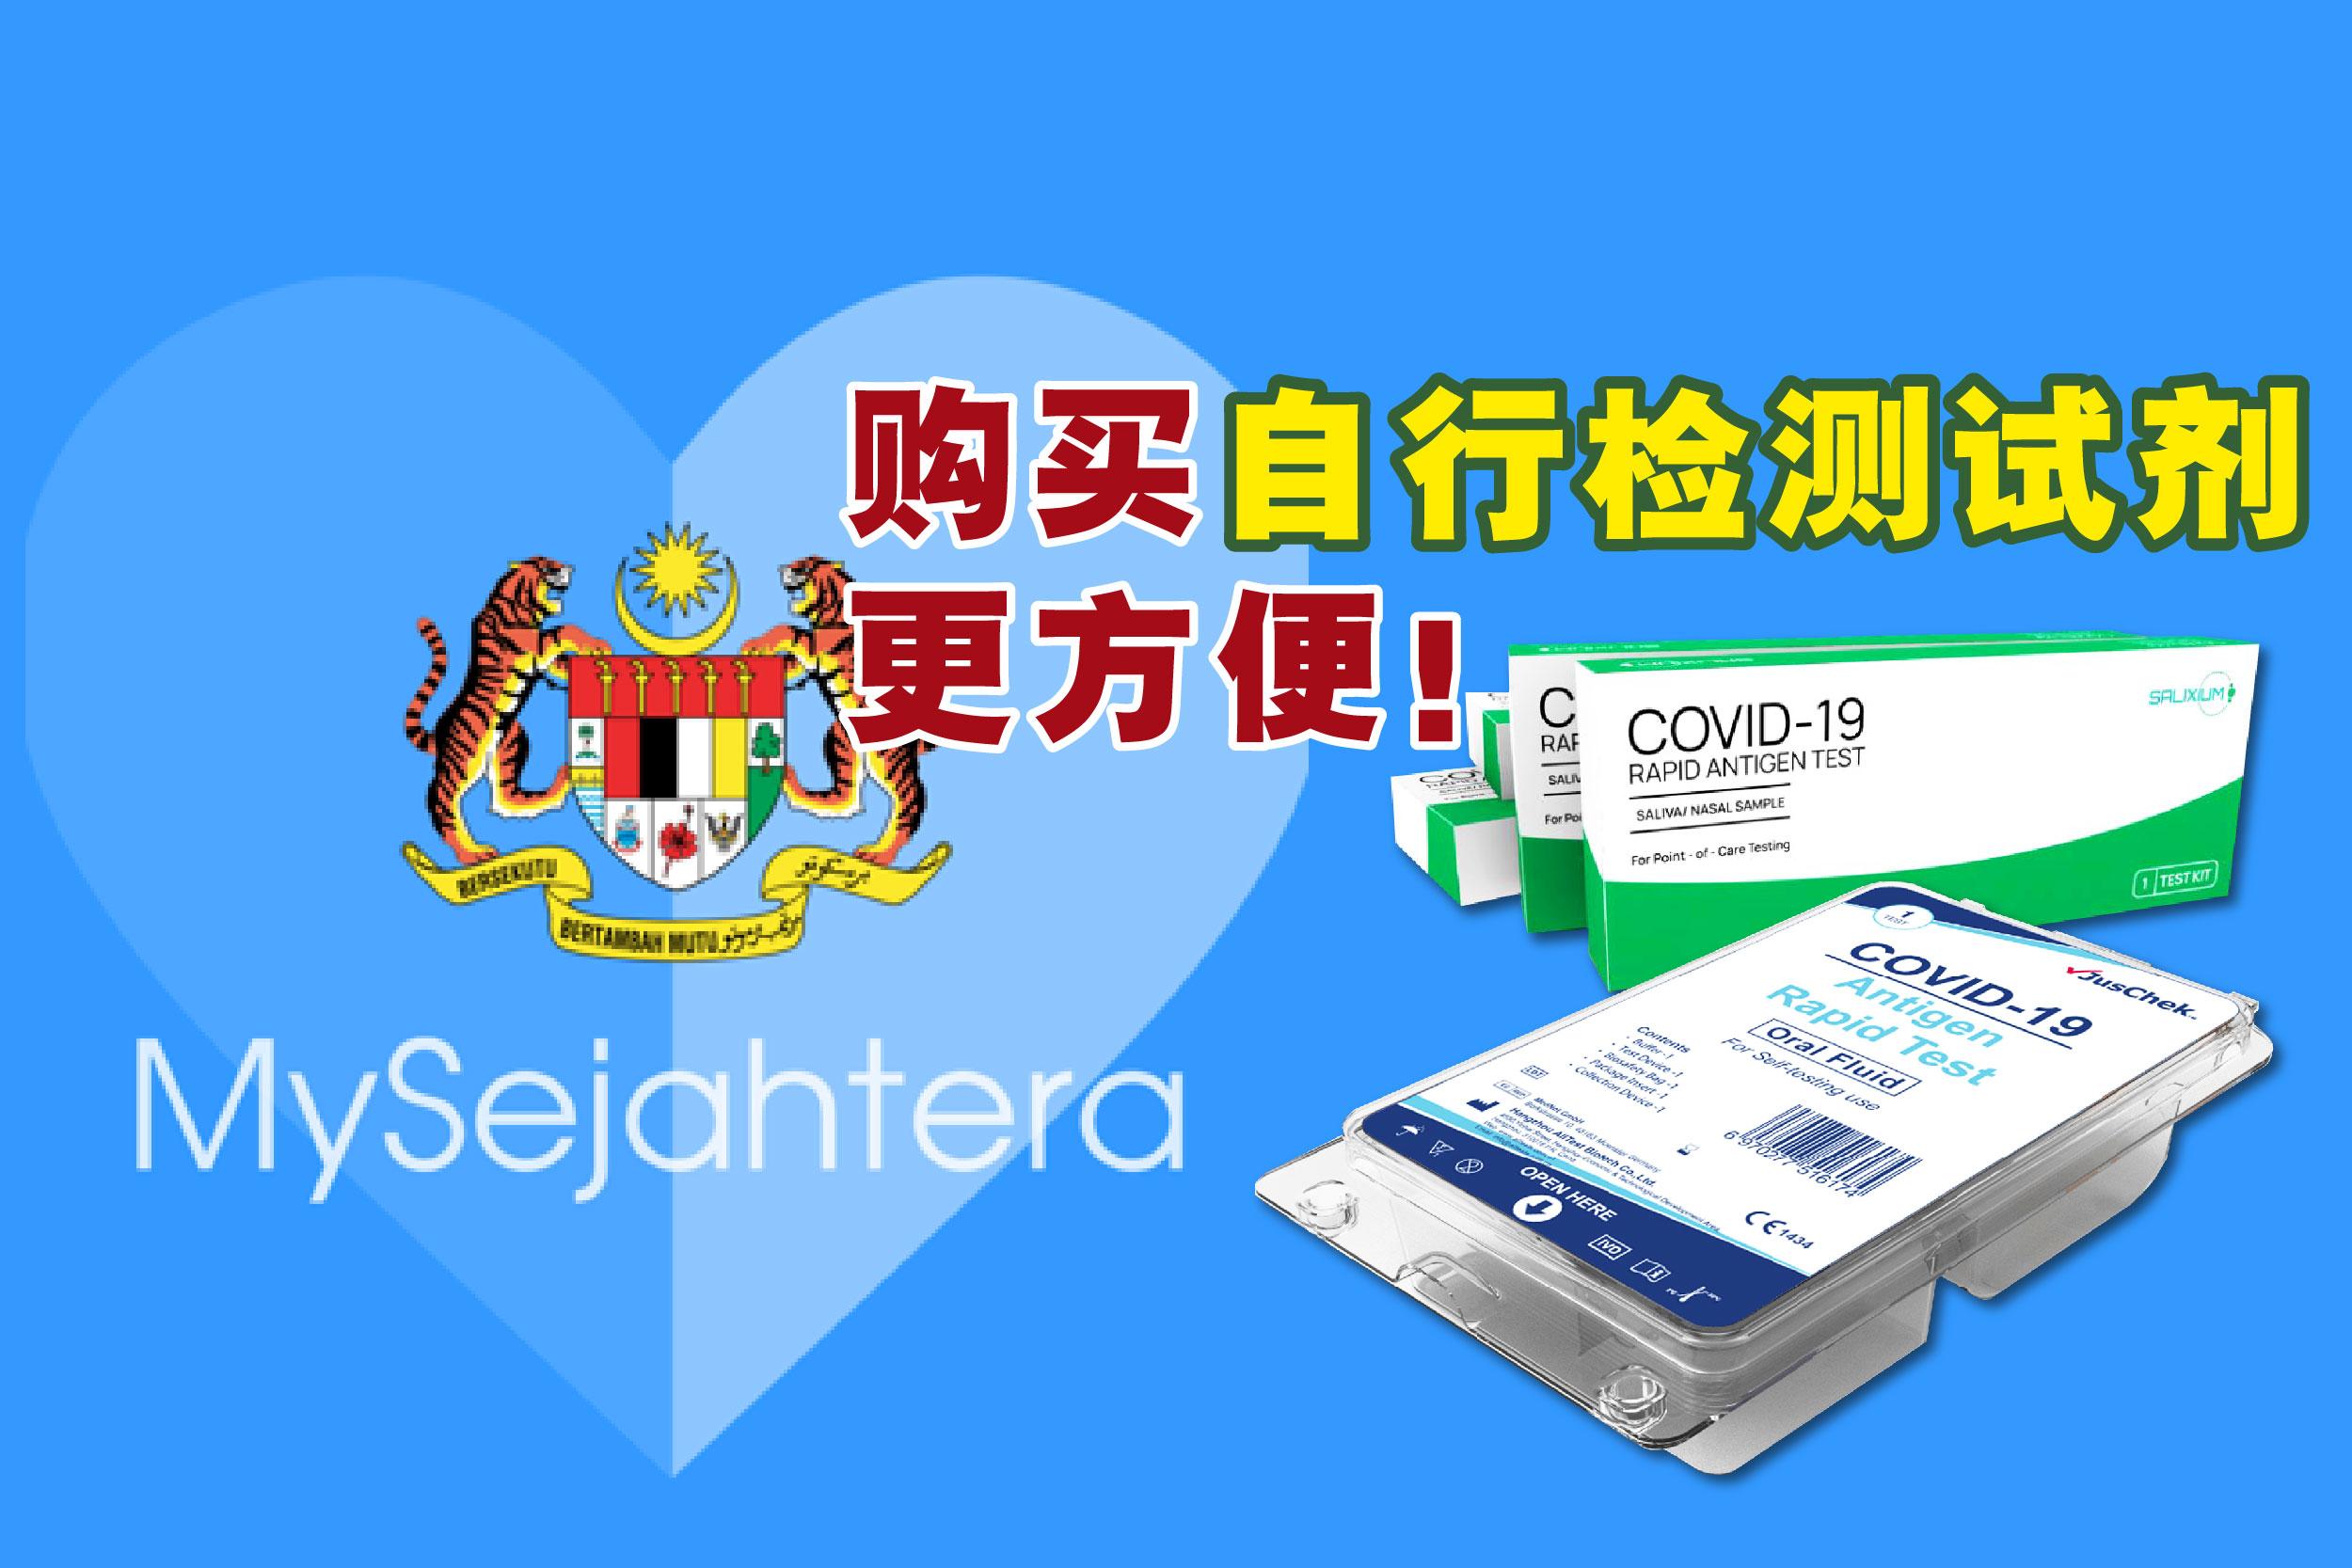 "MySejahtera应用程序新增""COVID-19 Self Test""栏位,民众现在可订购获大马医疗器械管理局(MDA)有条件批准的自行冠病检测试剂盒。-图取自MySejahtera应用程序脸书和pharma2u官网/精彩大马制图-"